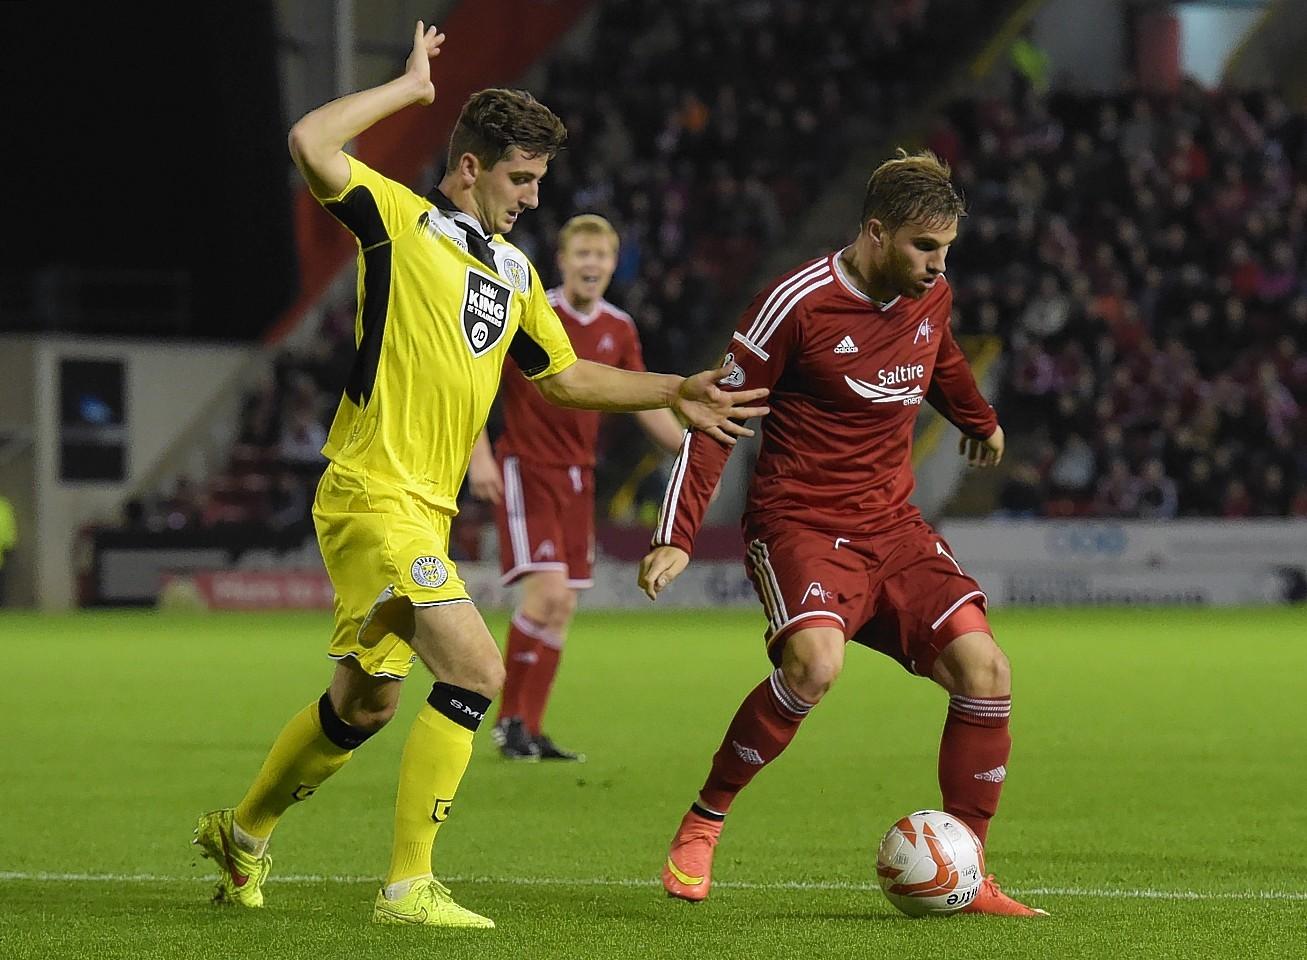 McLean closes down David Goodwillie when St Mirren met Aberdeen earlier this season